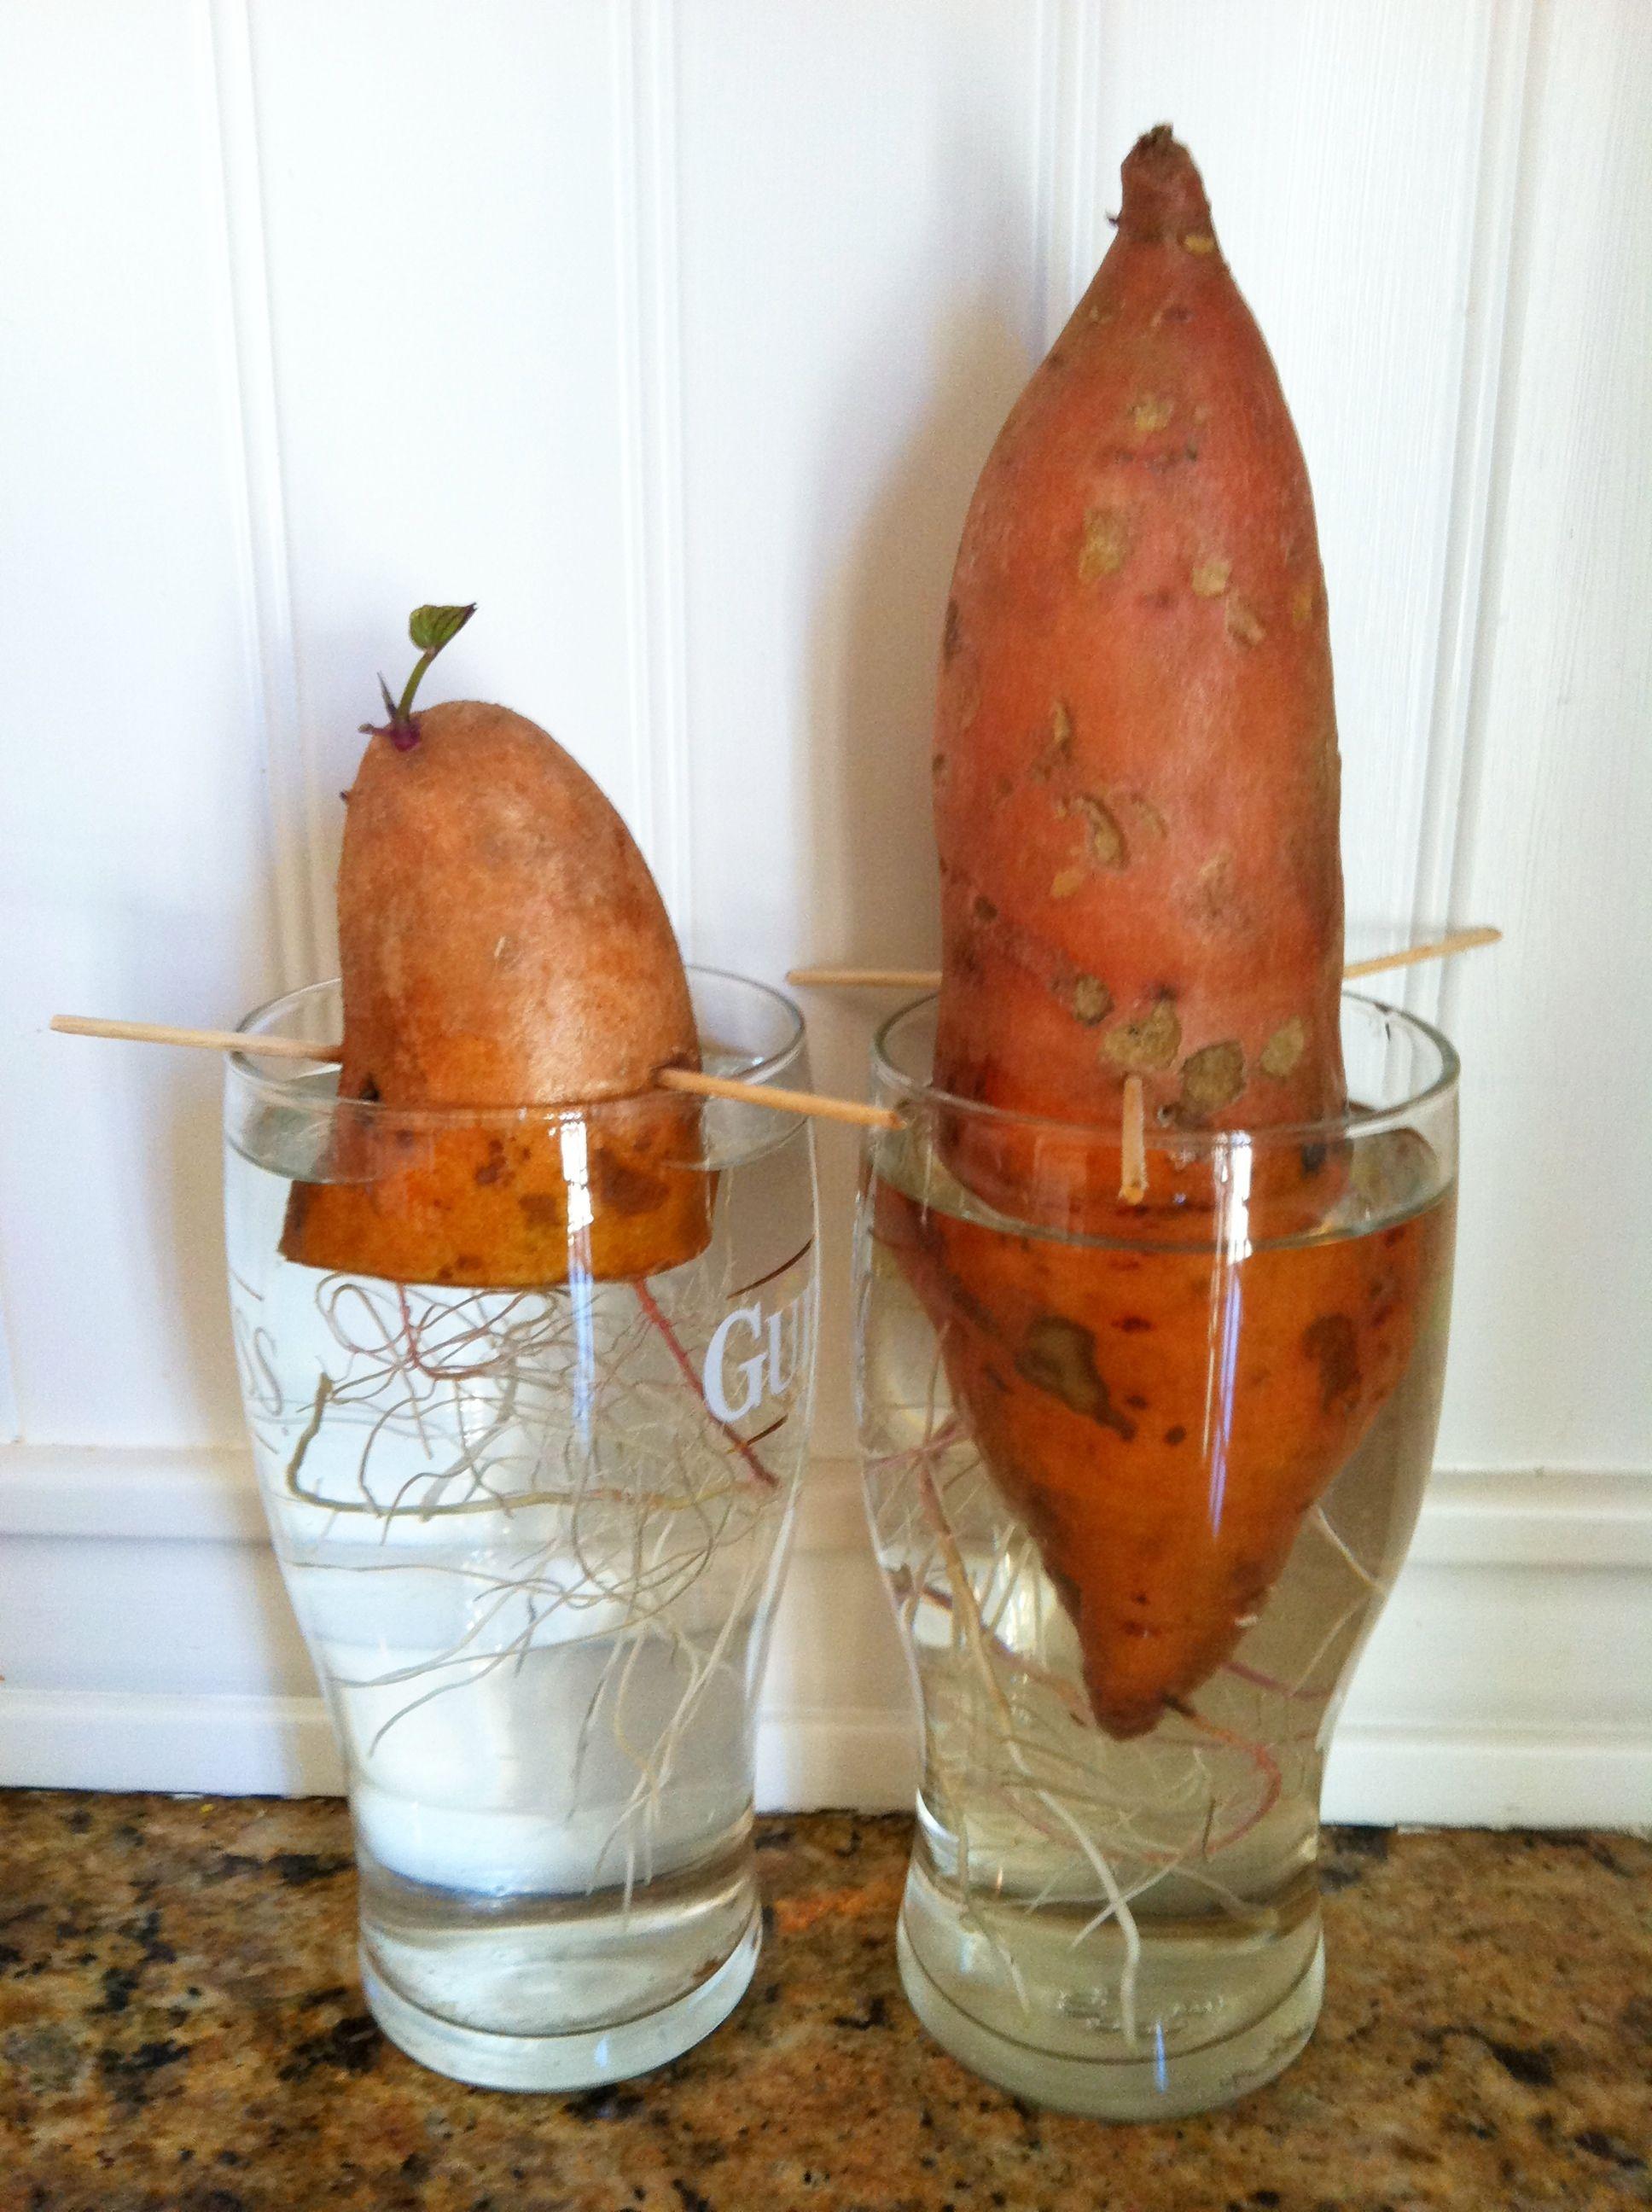 Grow sweet potatoes pineapple and more the organic